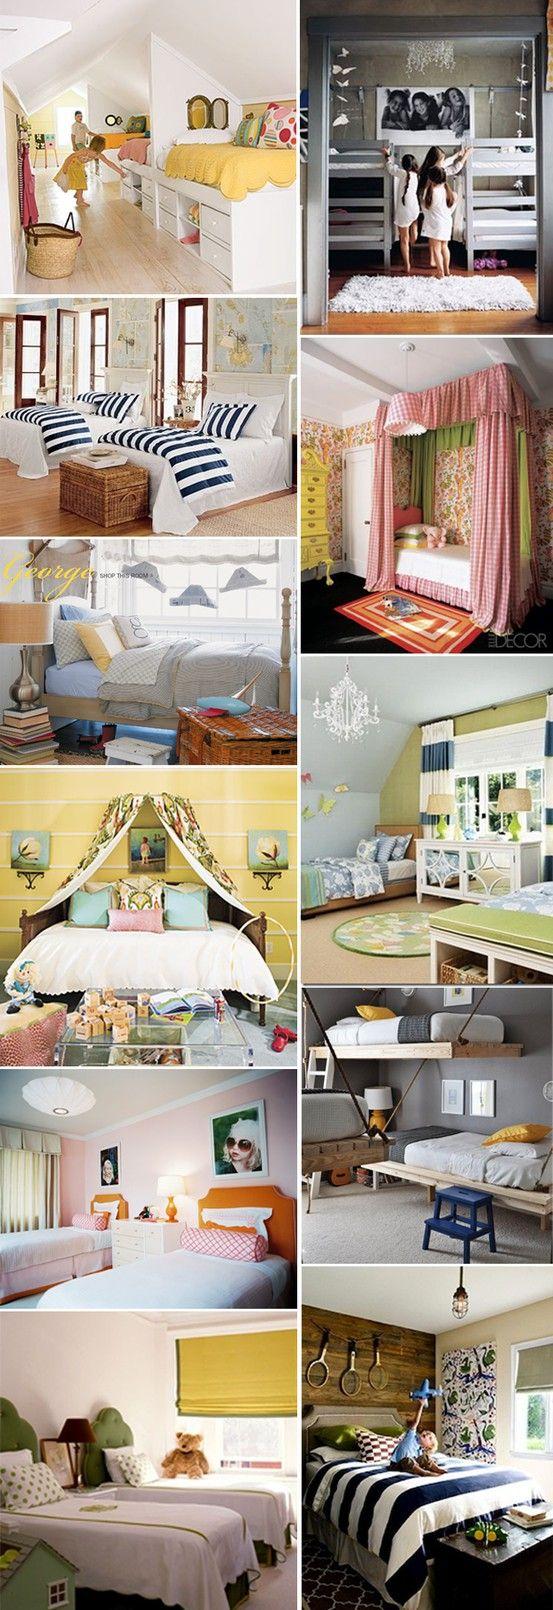 SaiFou Image |Love these bedroom ideas